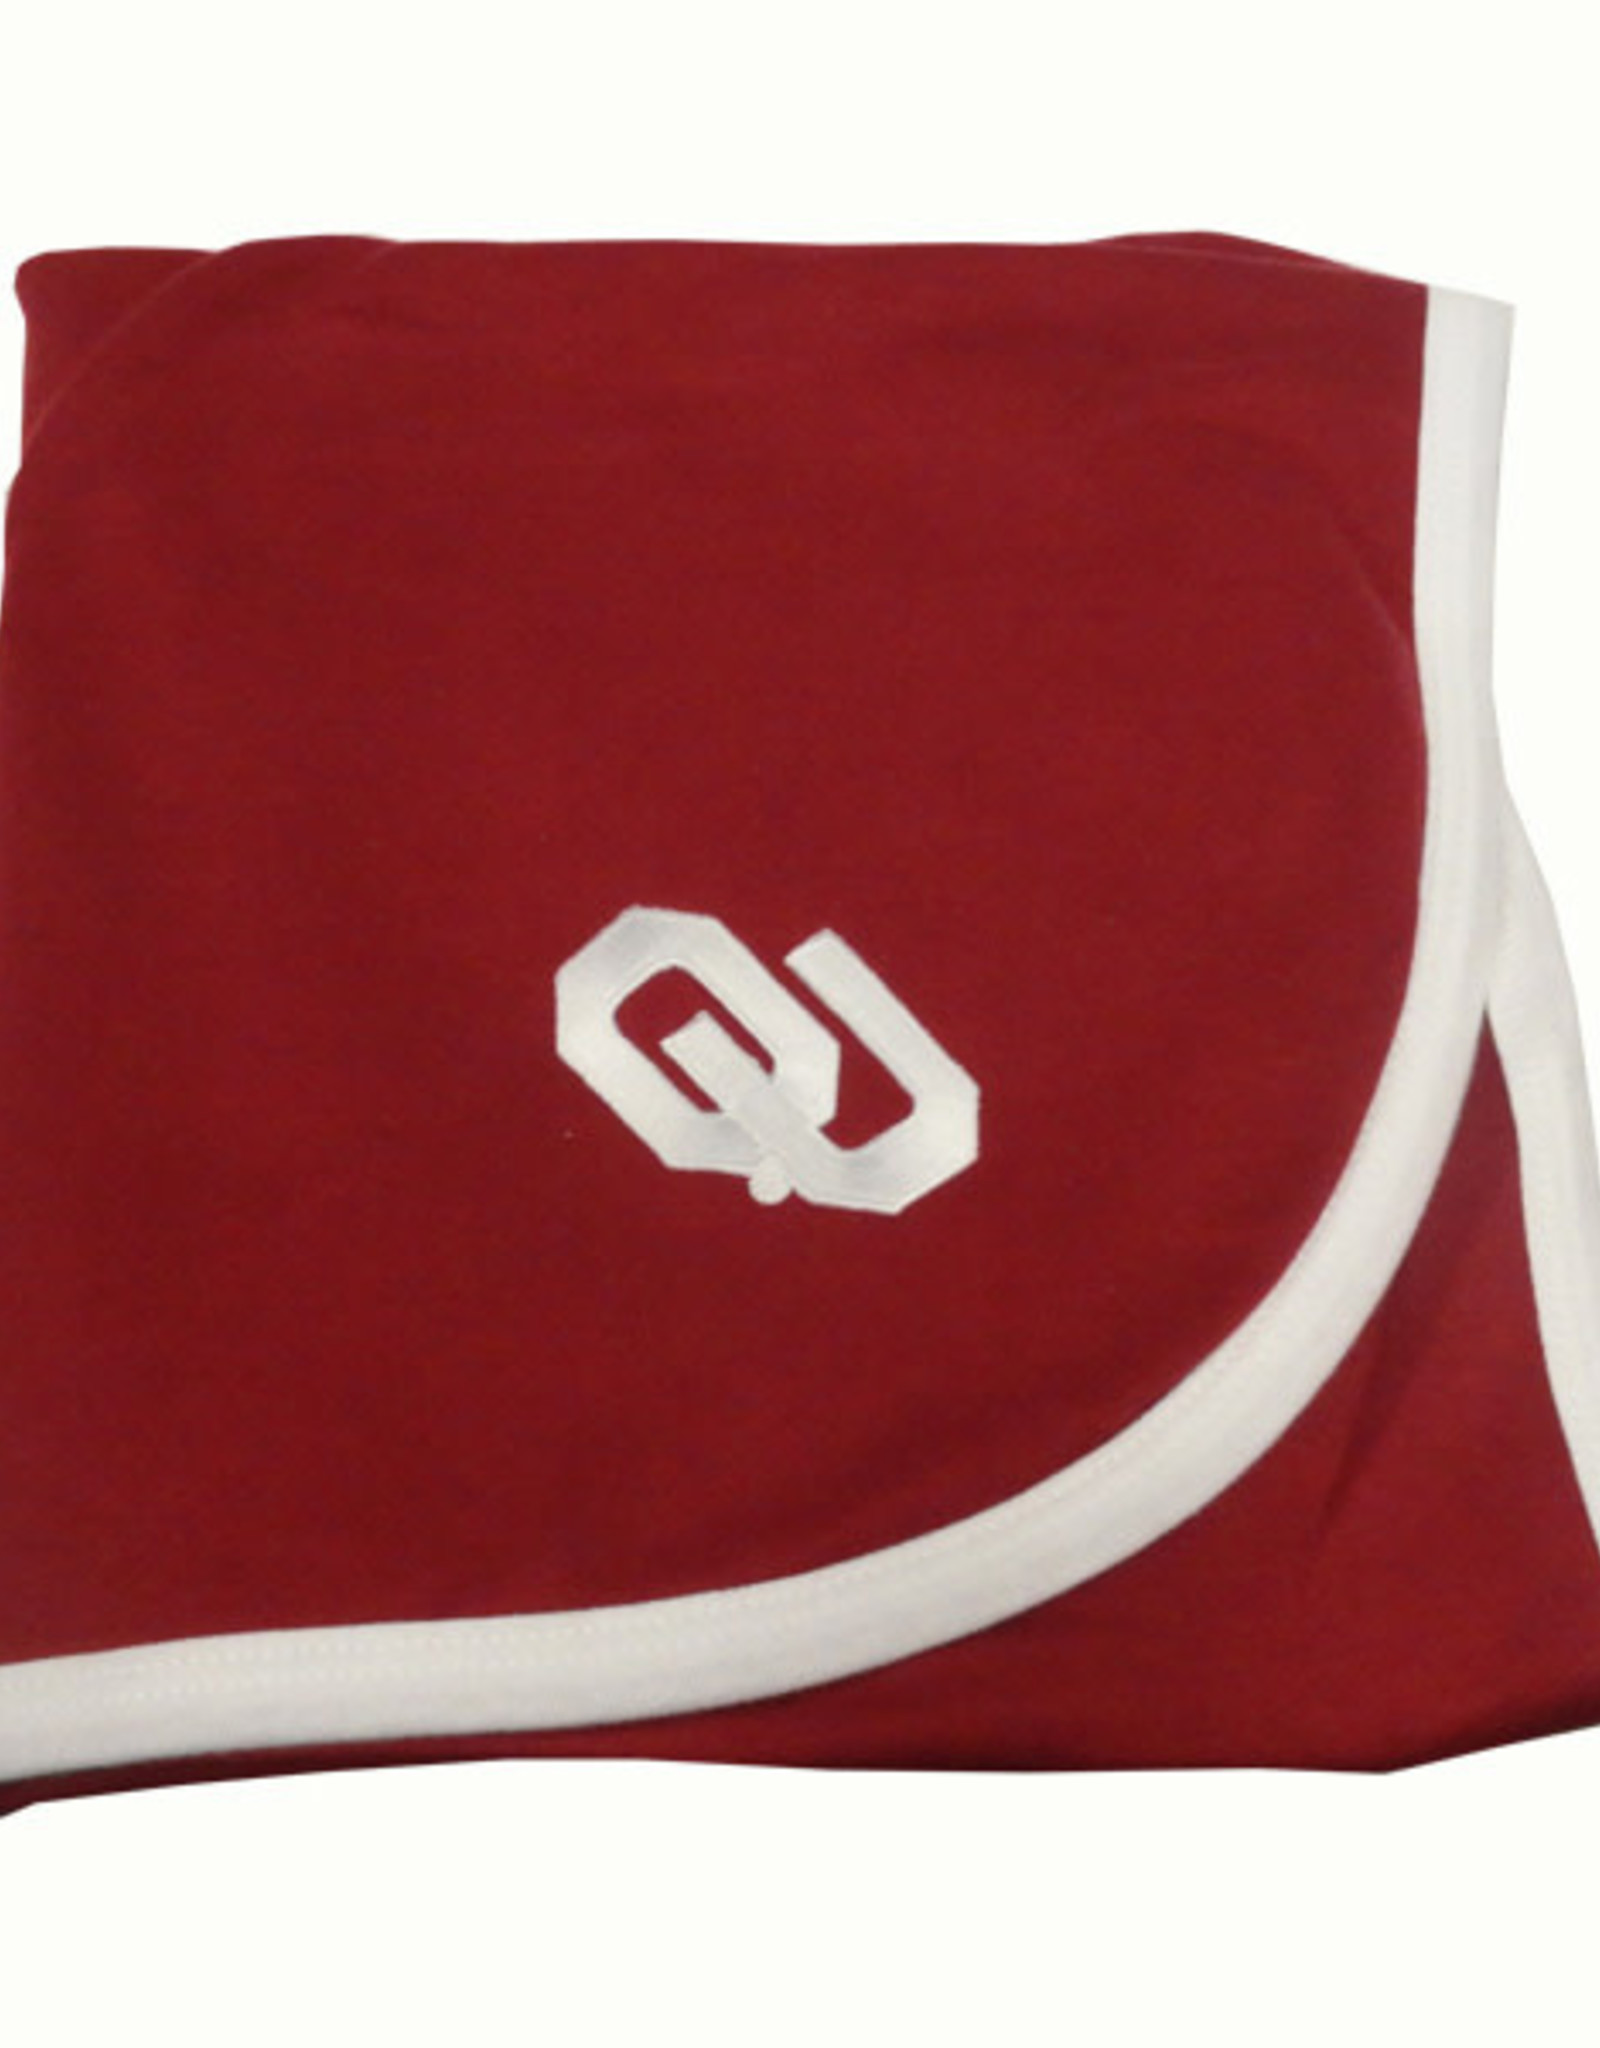 Two Feet Ahead OU Crimson Baby Blanket